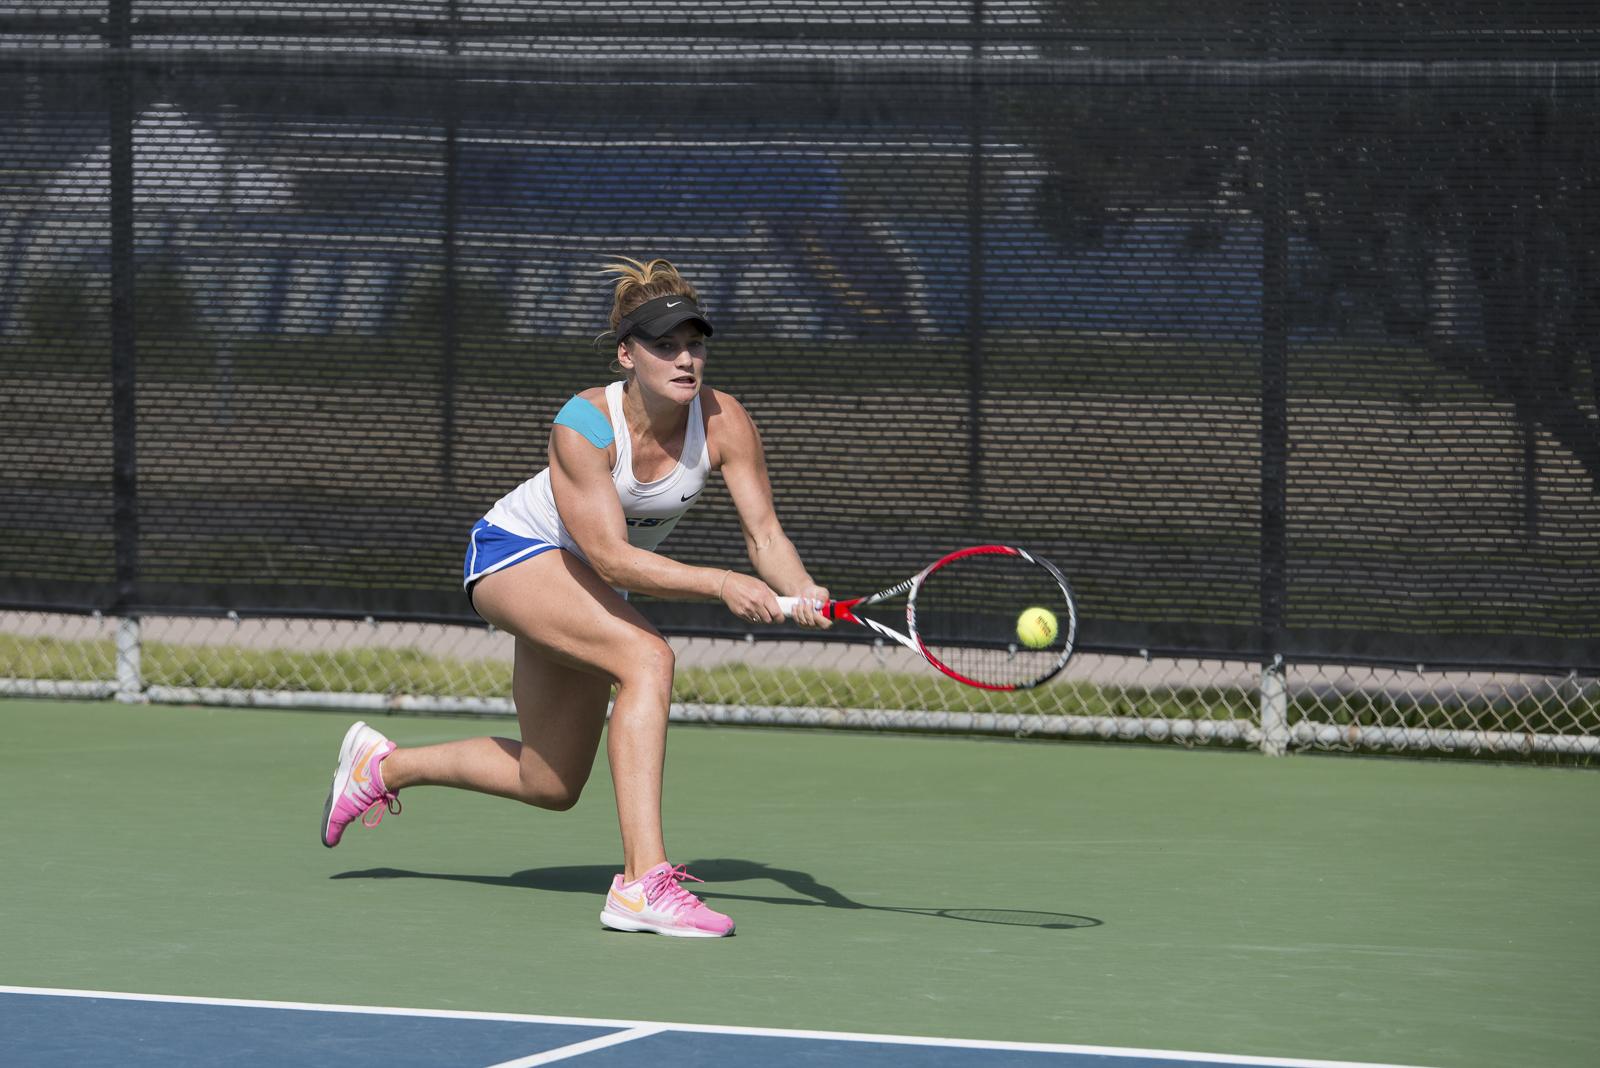 Jaimee Gilbertson rushes to return an angled shot to her backhand side. Eric Swenson/Daily Nexus